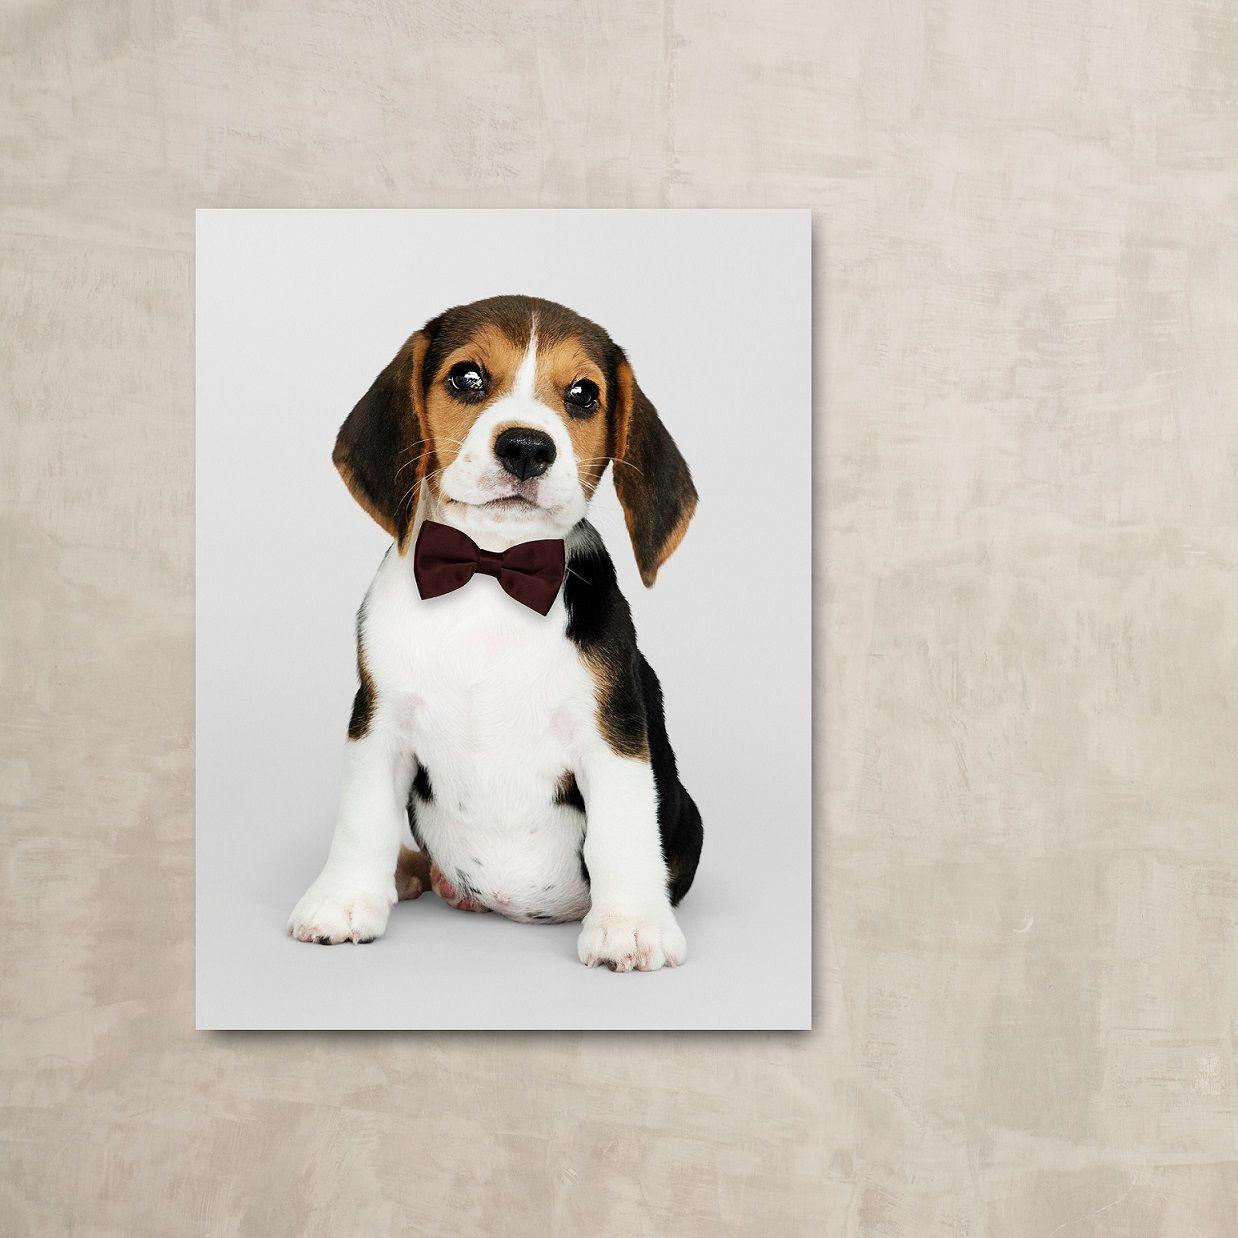 Placa decorativa PERSONALIZADA PET